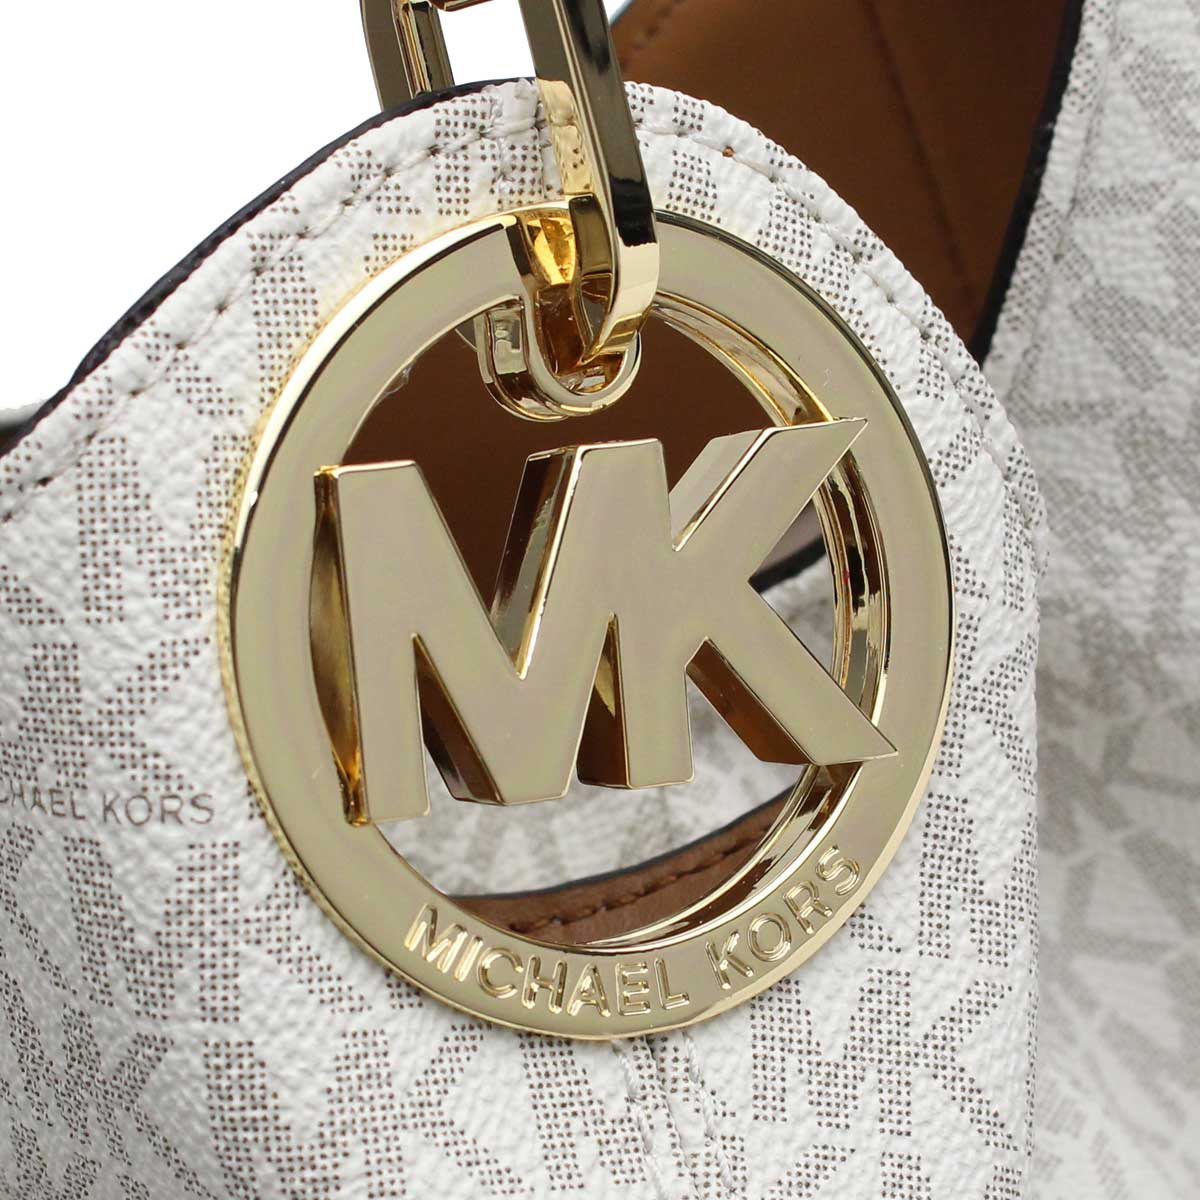 3c6cab5bf43fbb Bighit The total brand wholesale: Michael Kors MICHAEL KORS FULTON ...